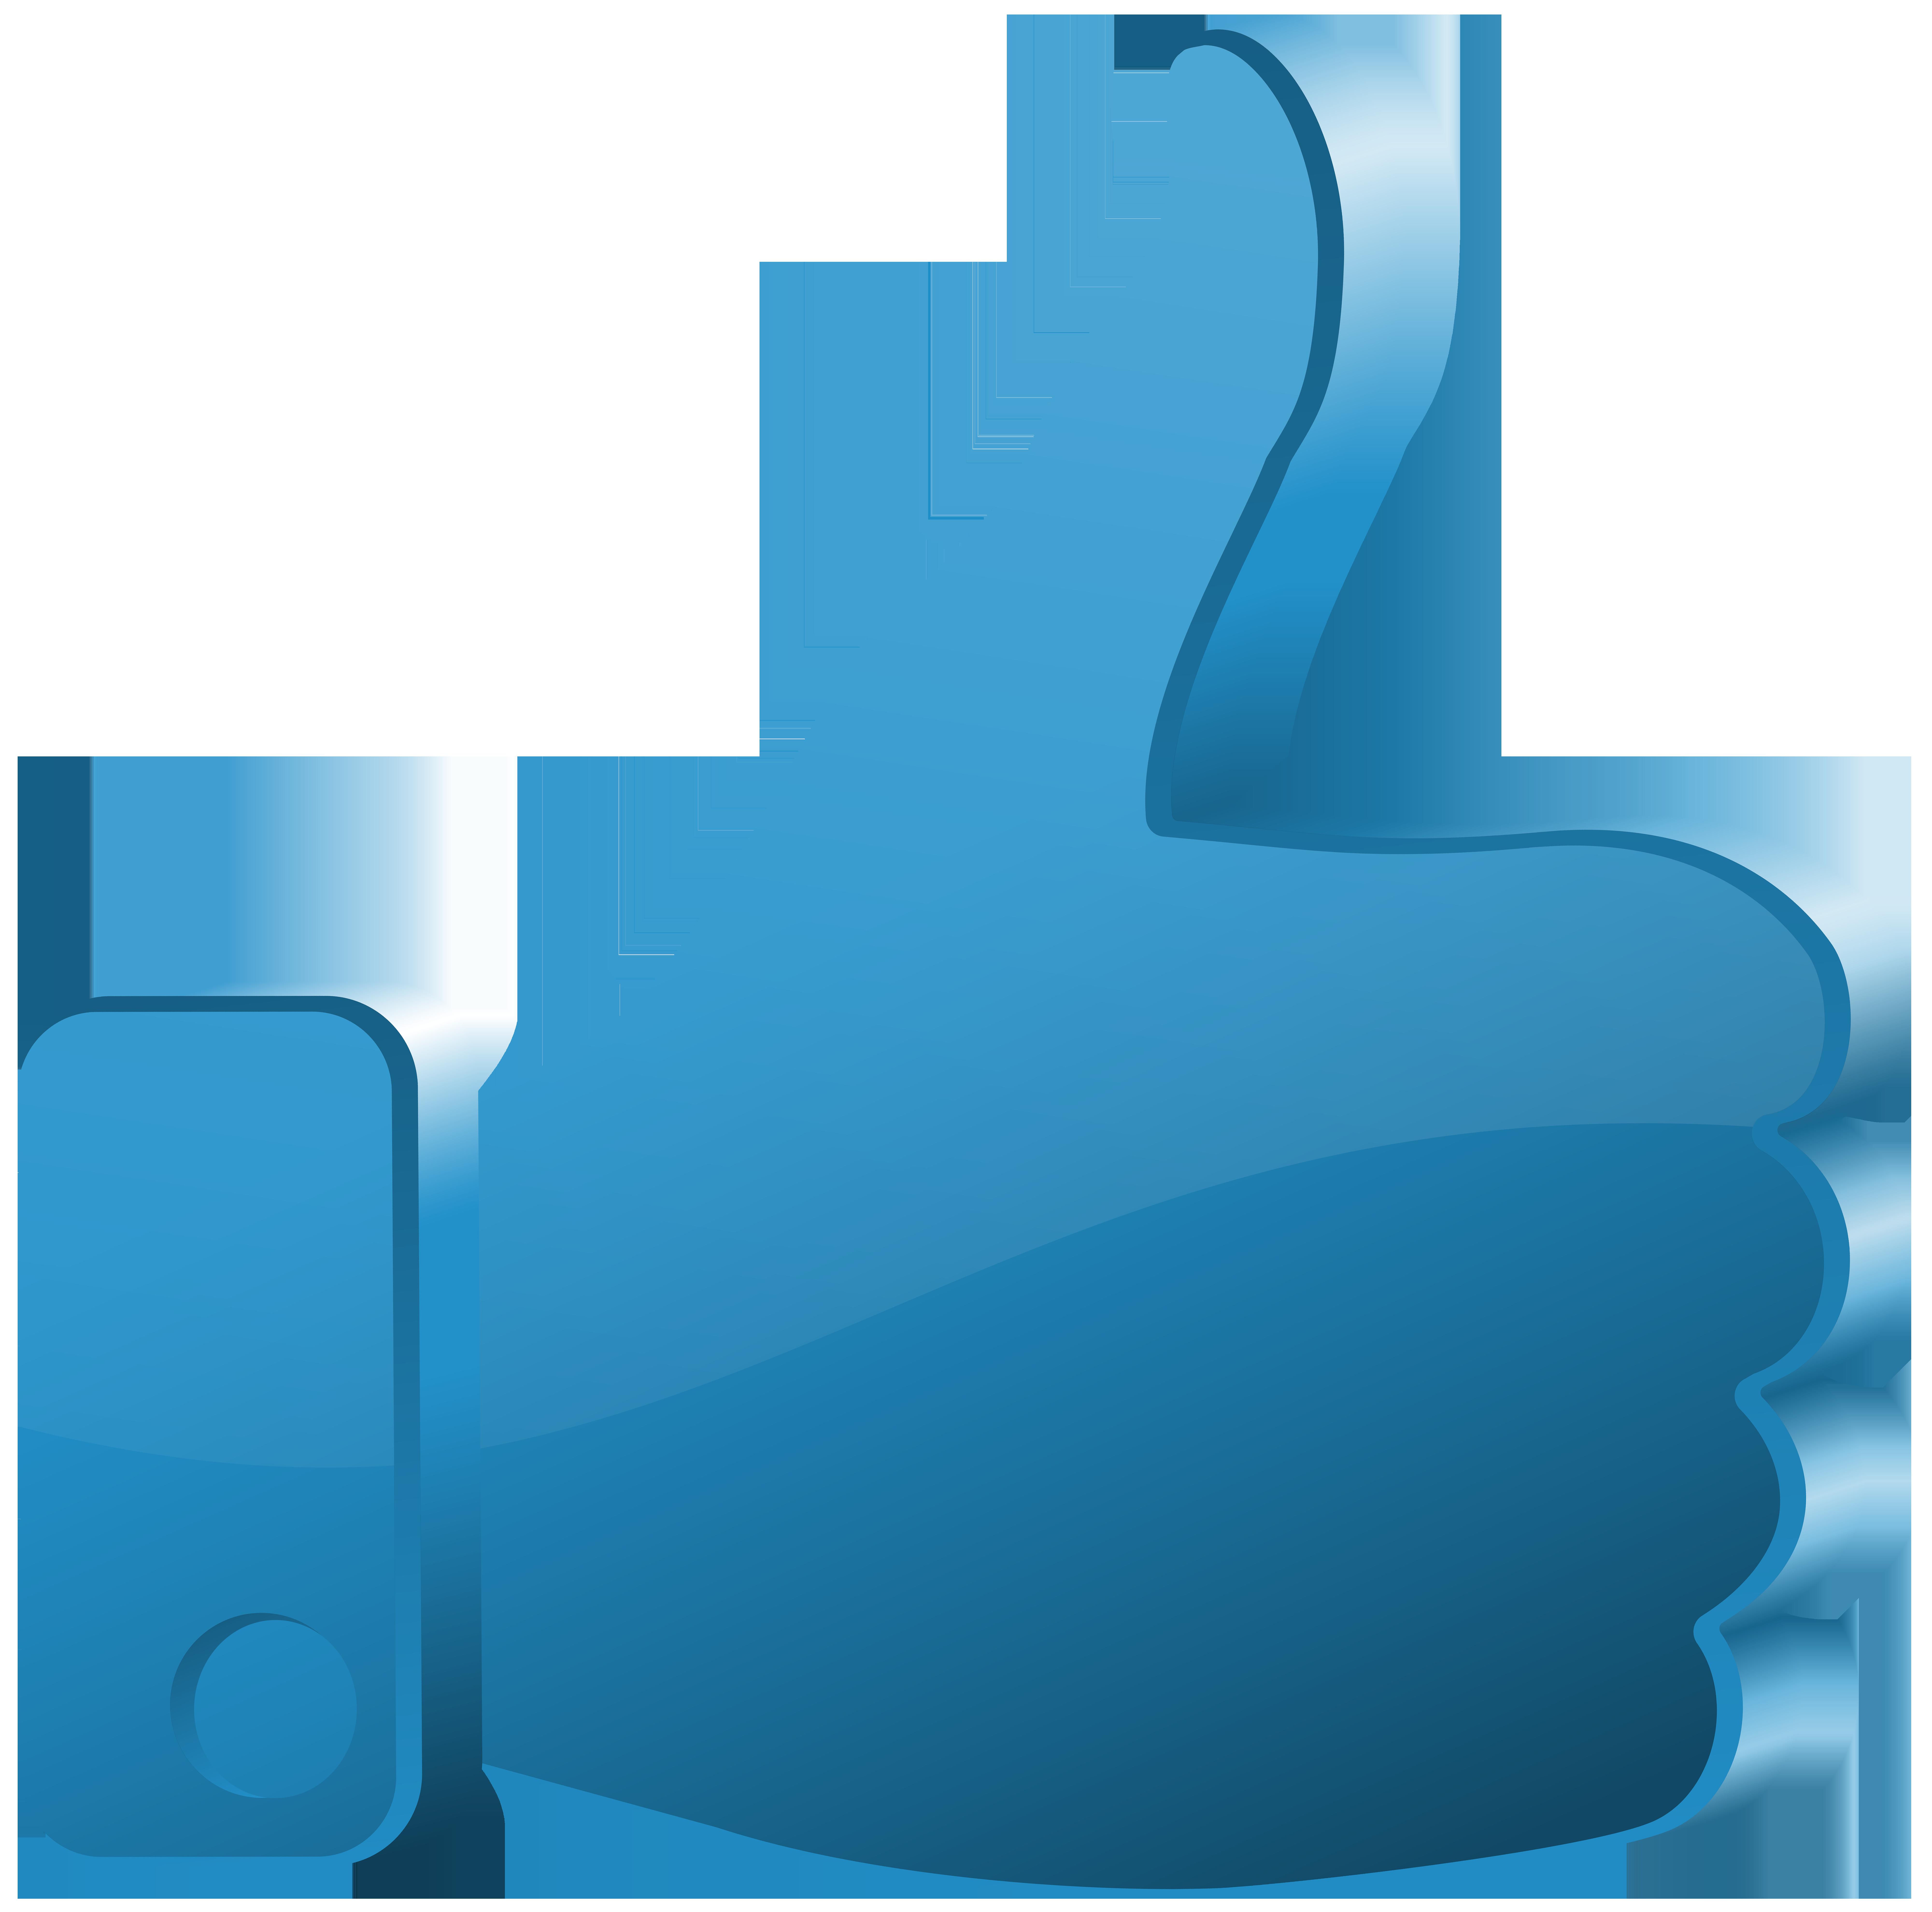 Up clipart png. Thumbs blue transparent clip